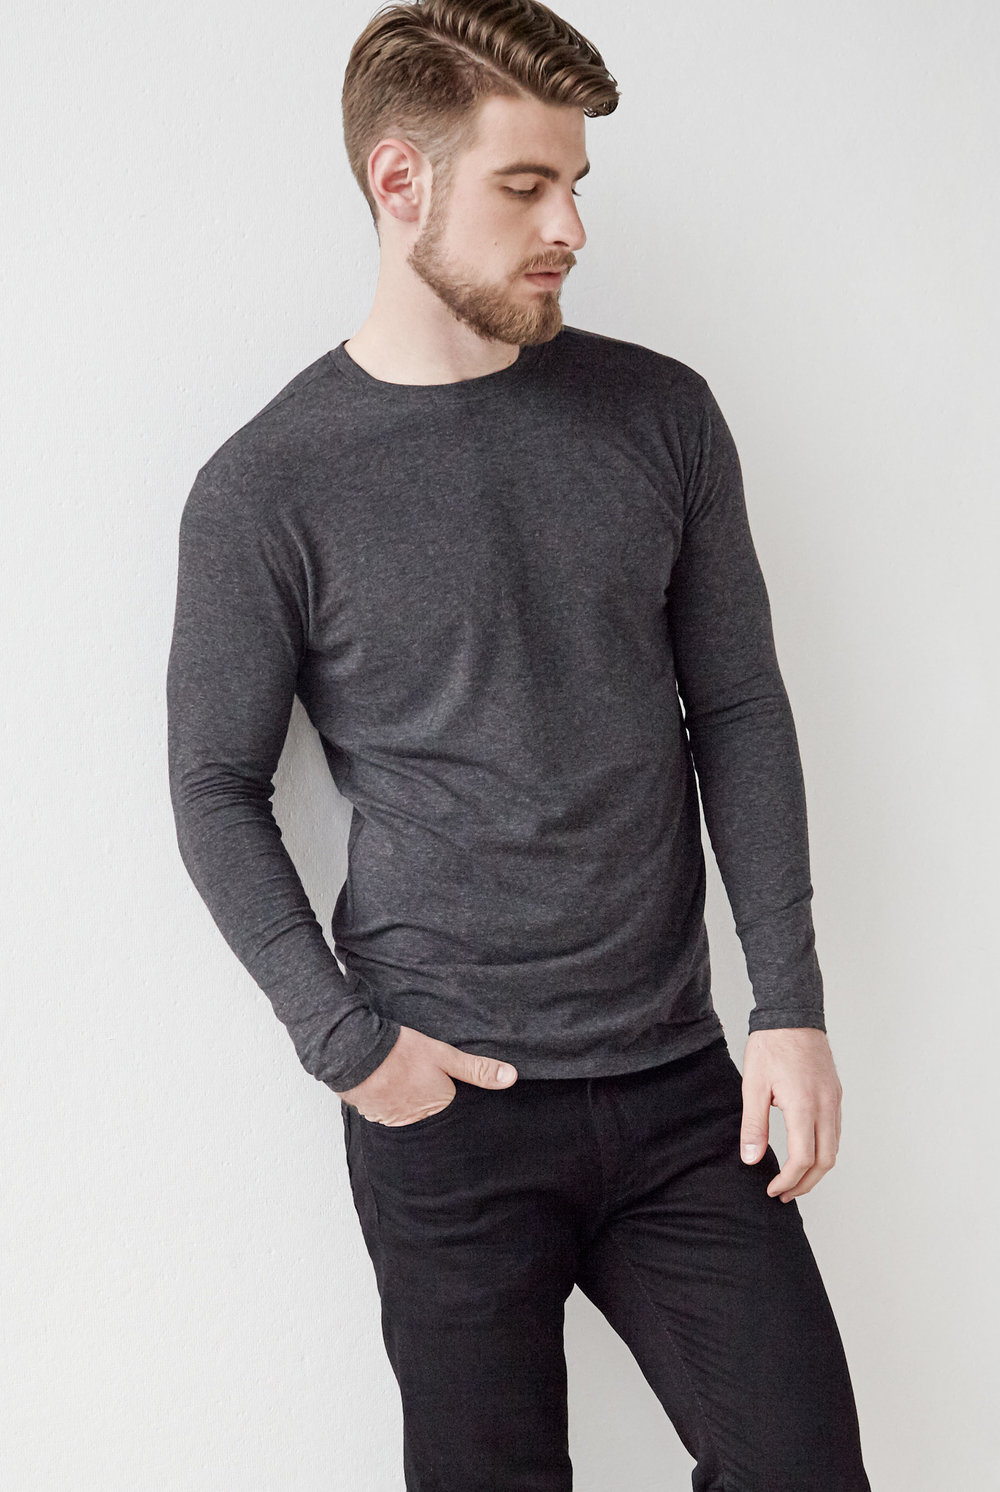 M-dark-grey-sleeve-tee-1.jpg